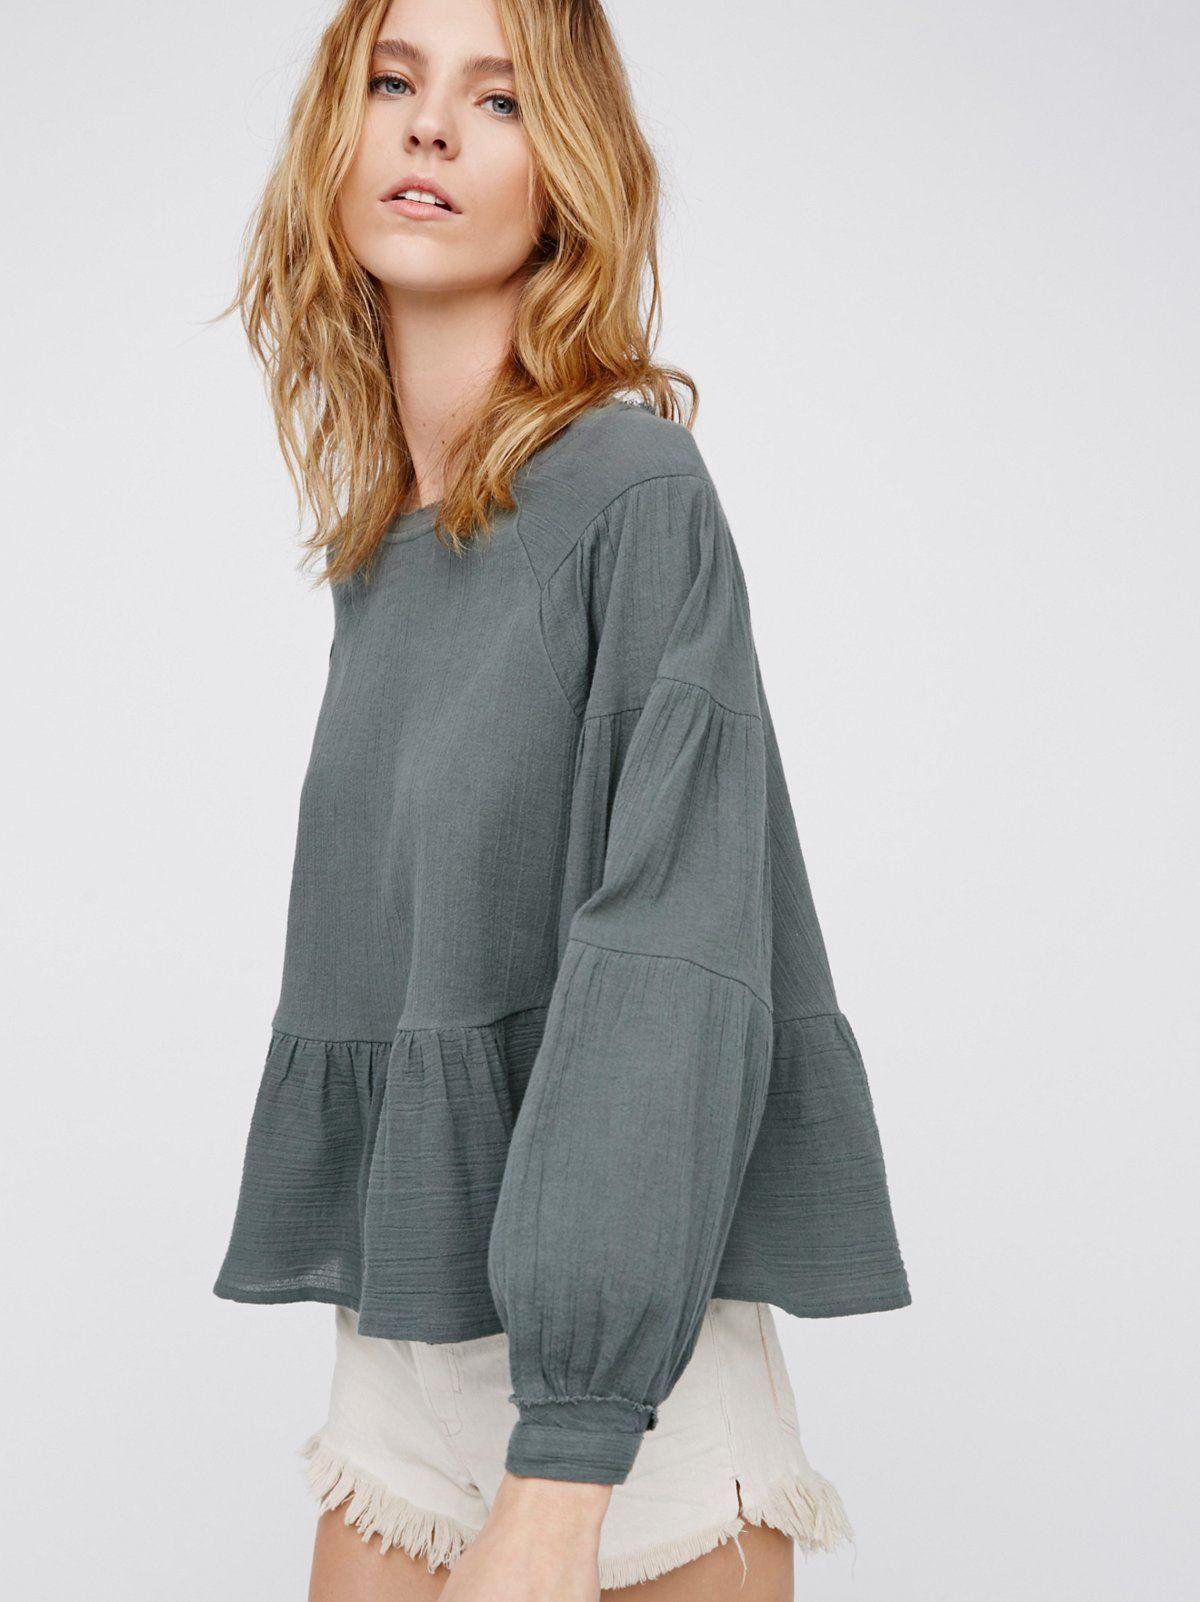 Крестьянка | Peasant style, Open shoulder tops, Style